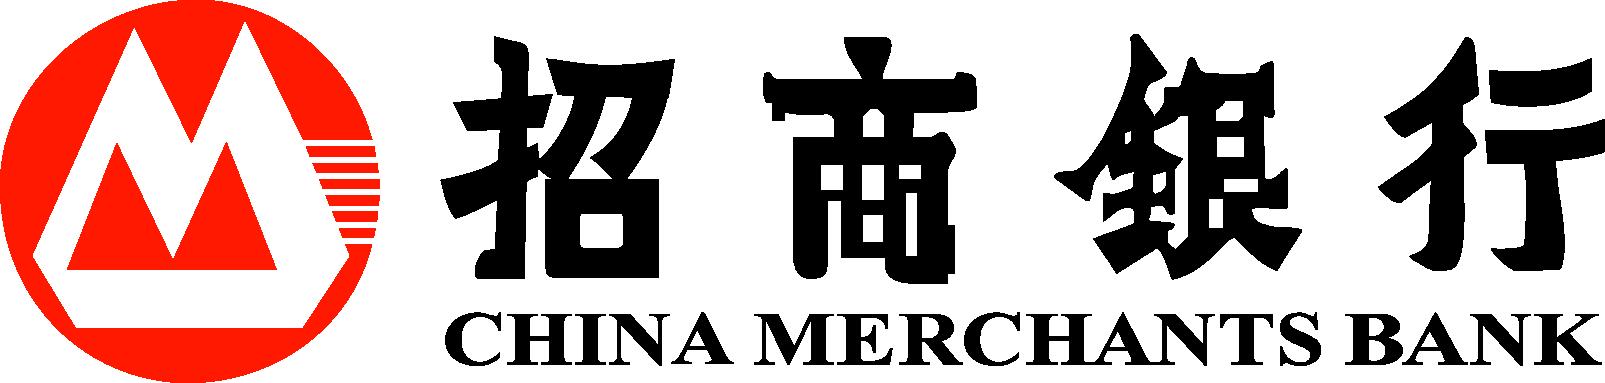 china-merchants-bank-logo